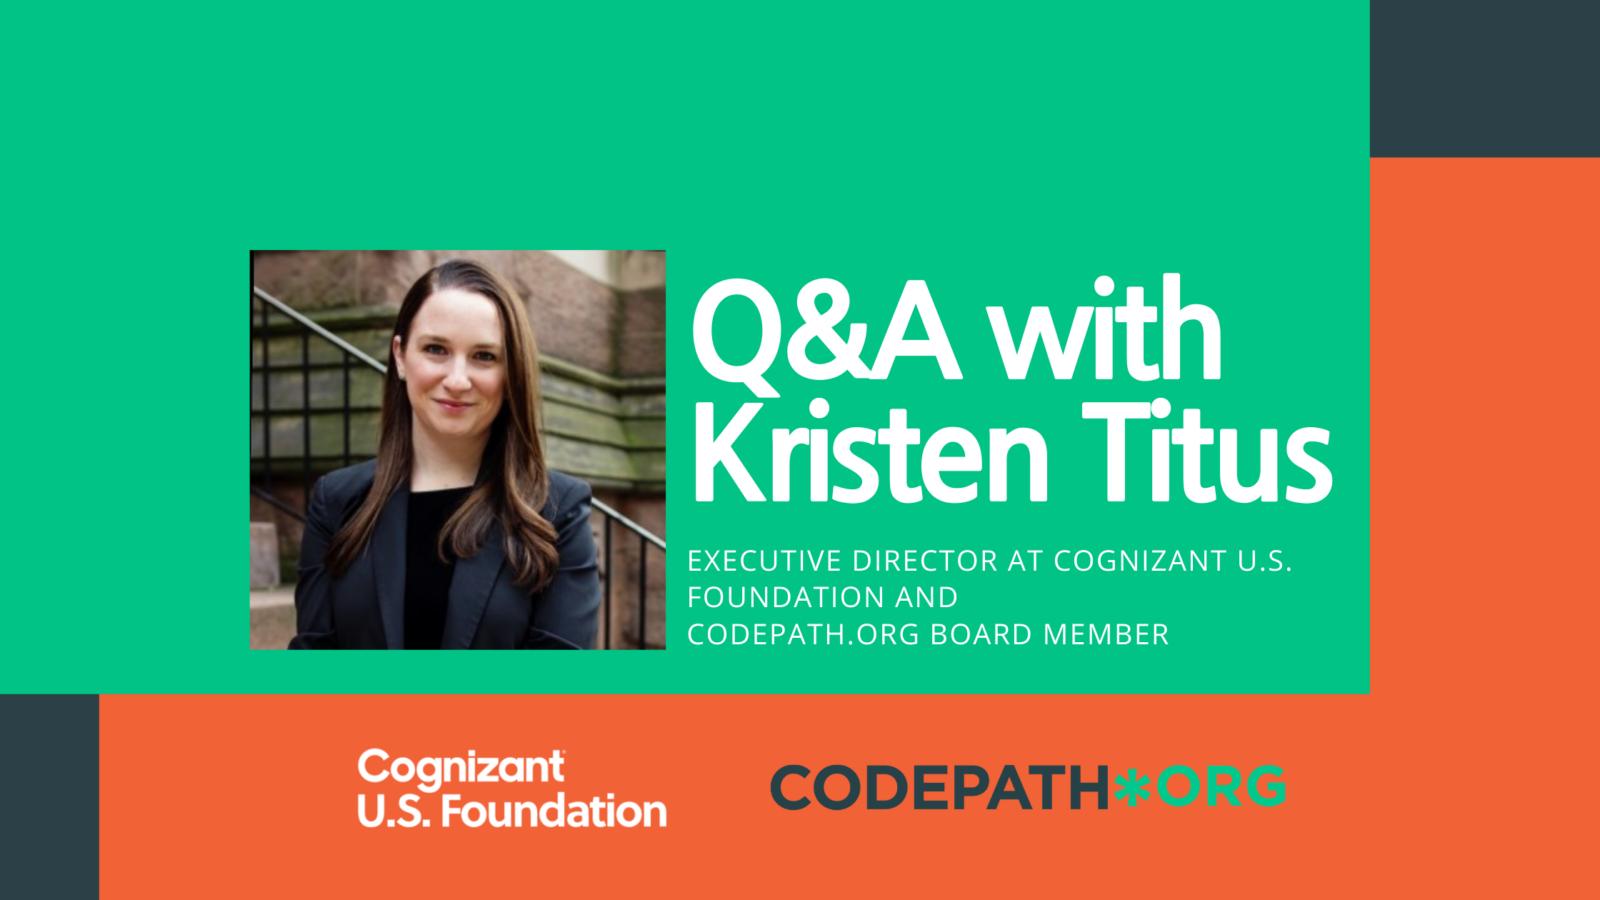 Q&A with Kristen Titus